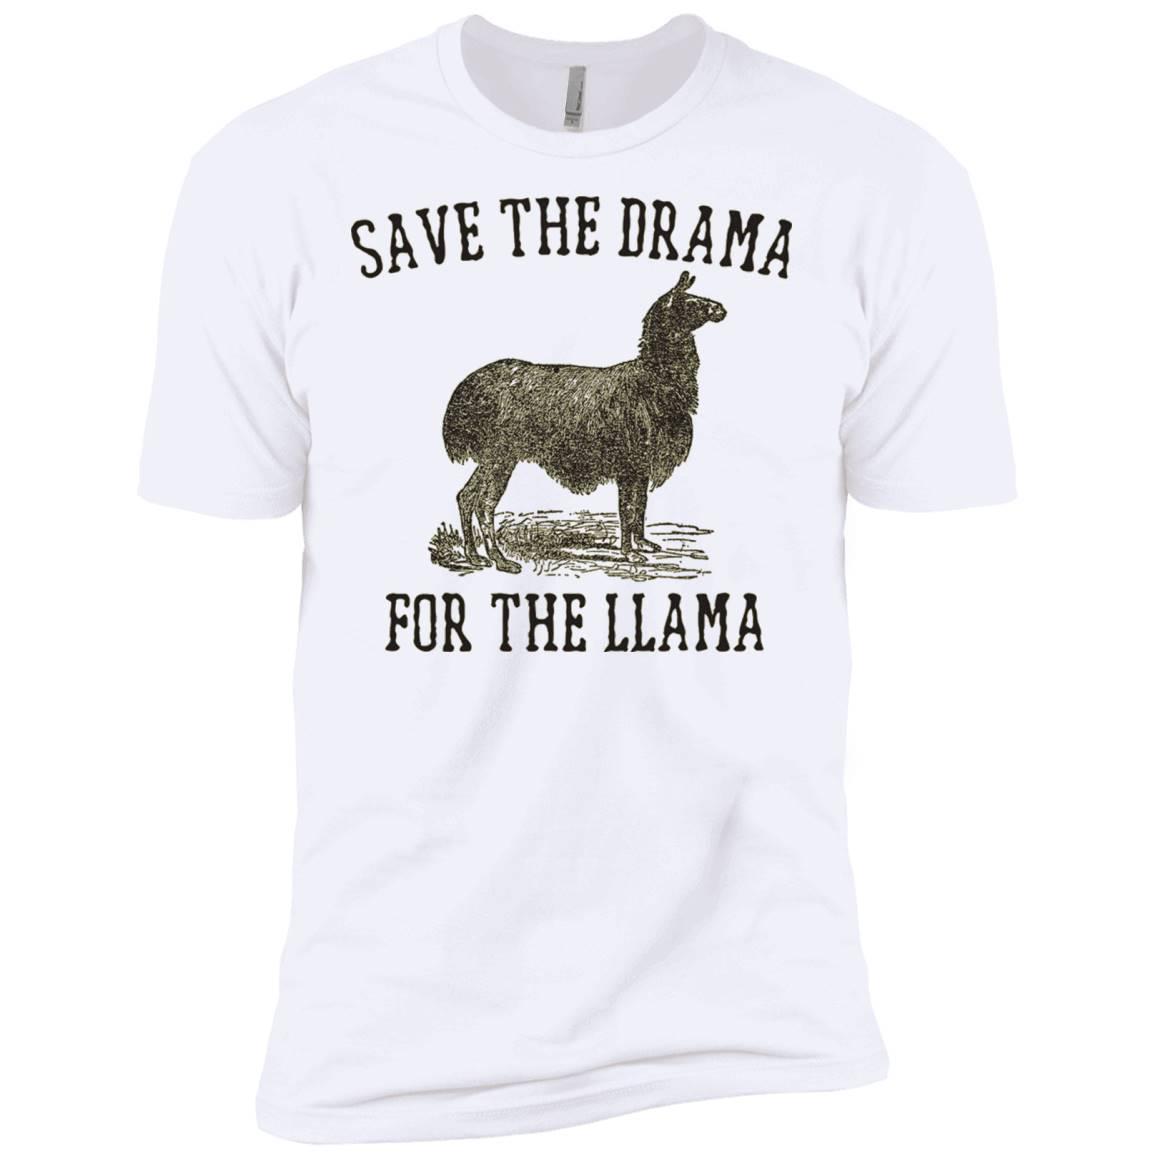 Fun Llama T-shirt – Save The Drama For The Llama T-shirt – T-Shirt